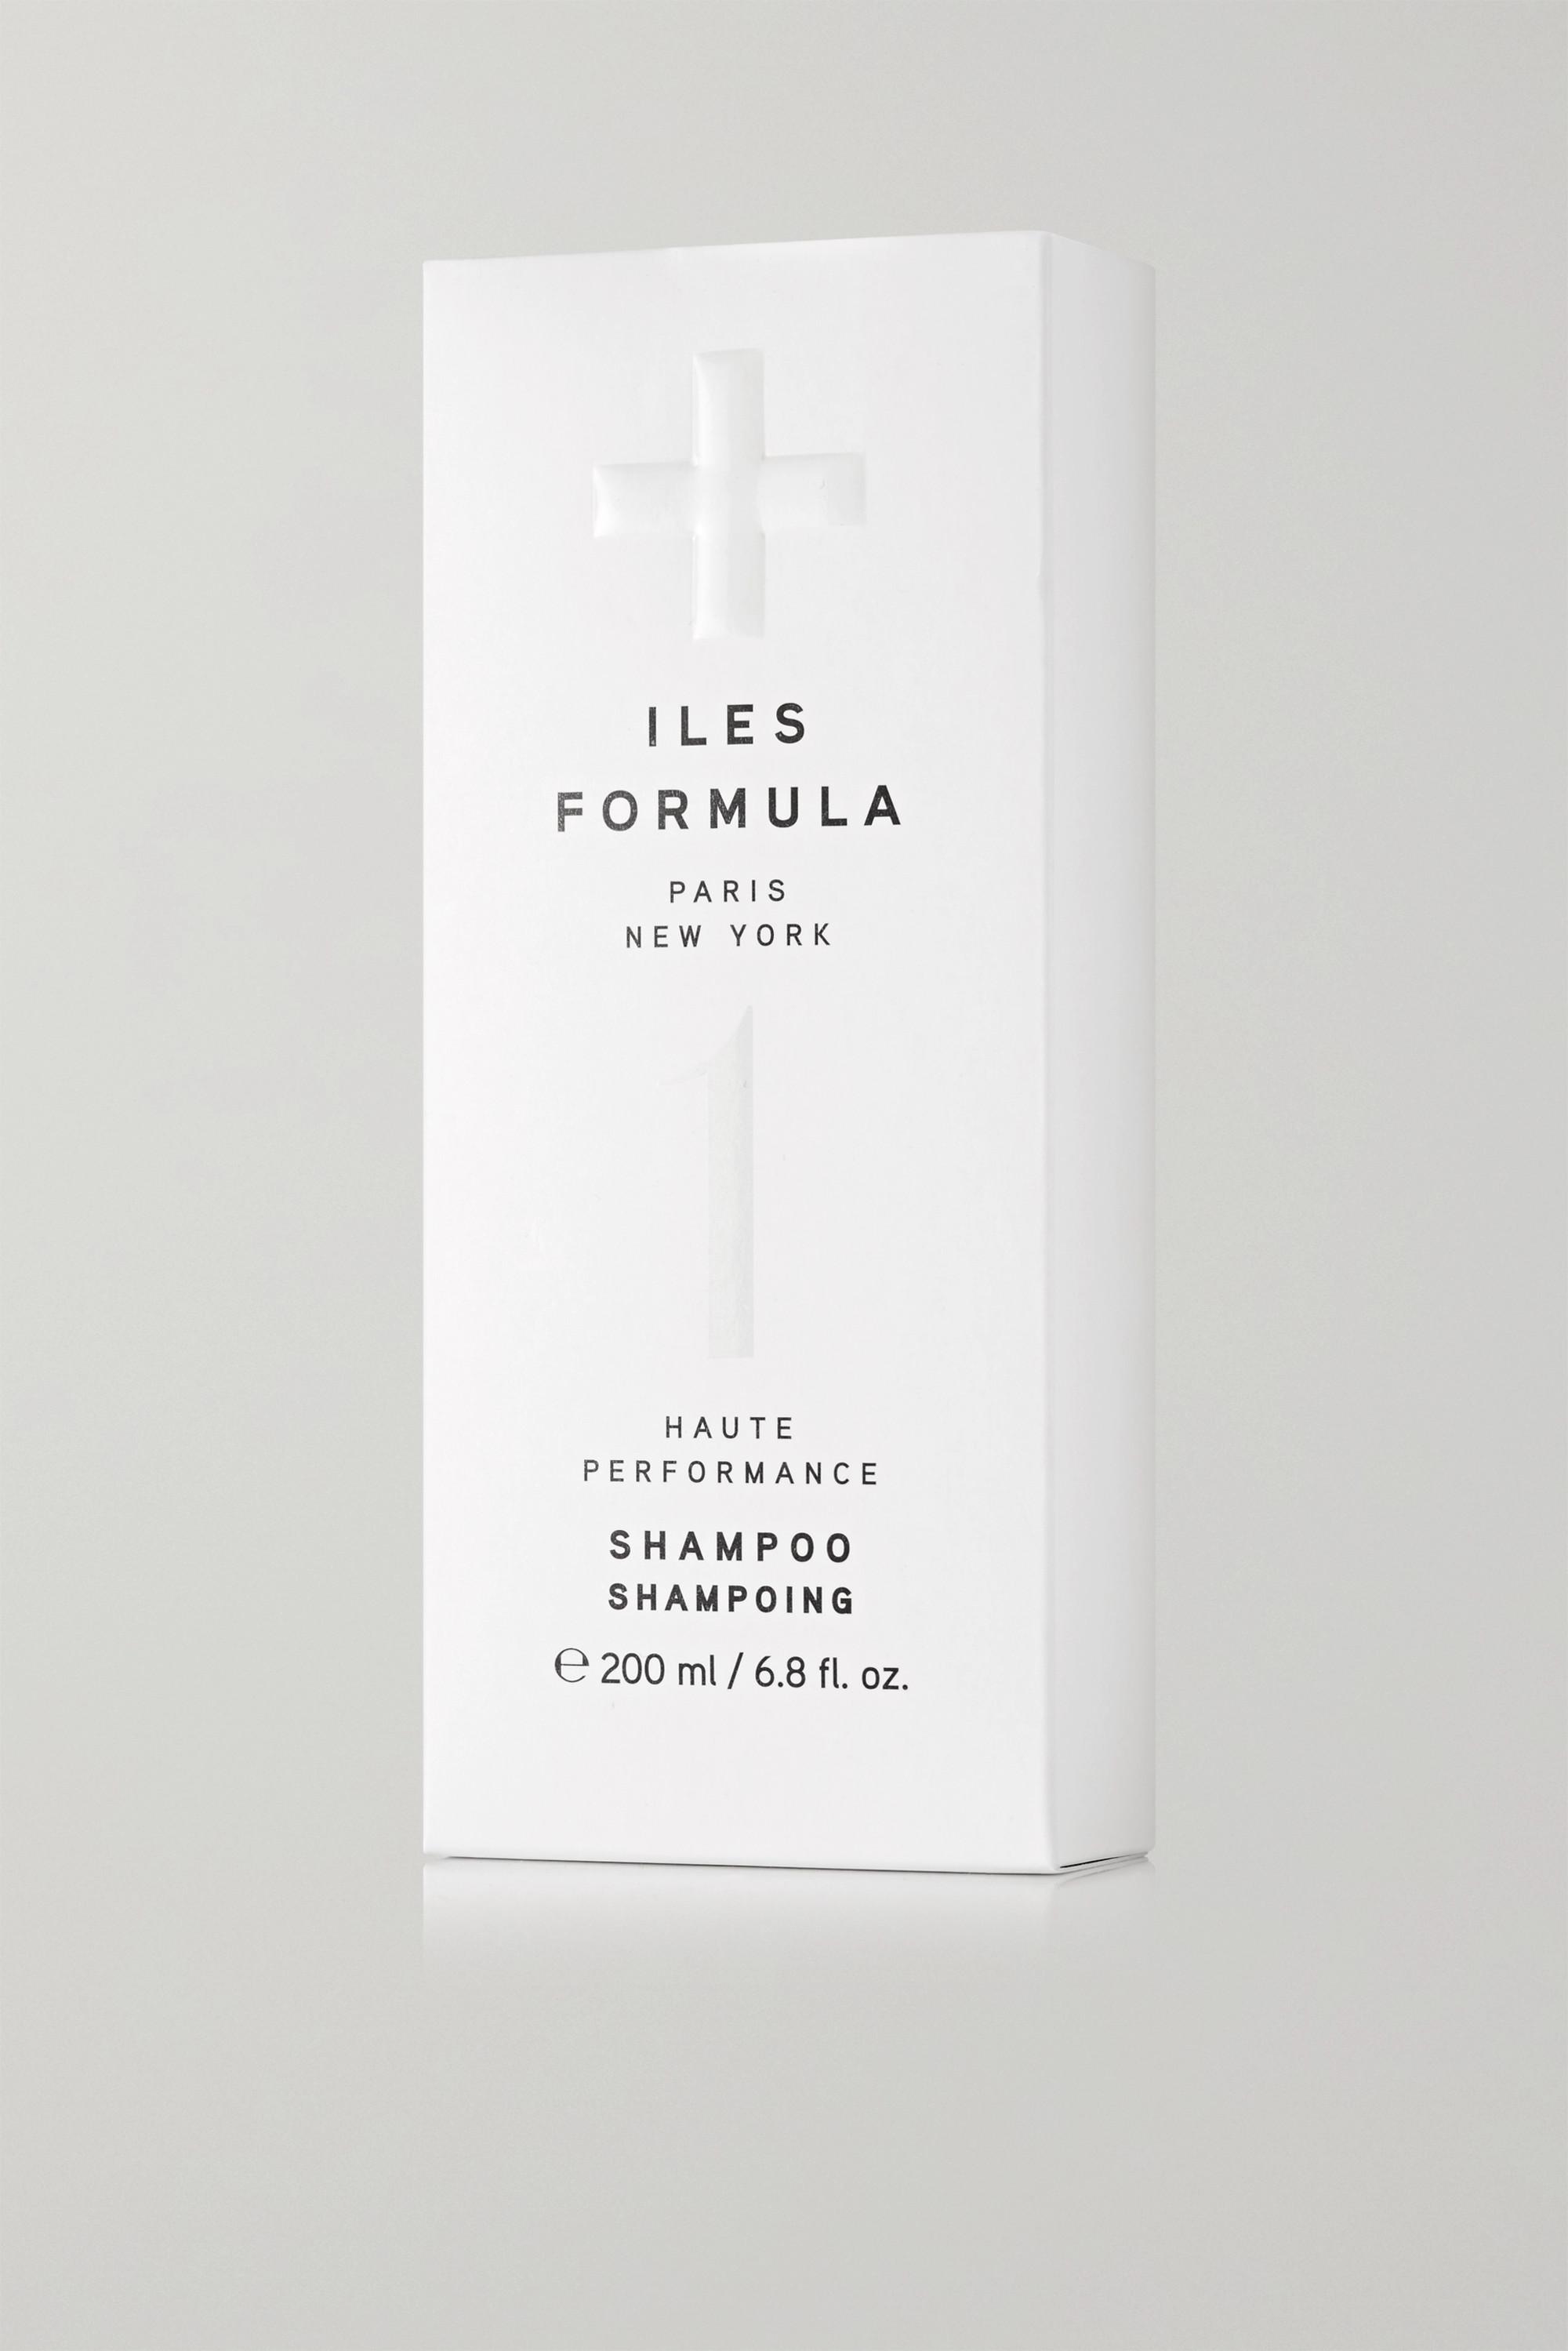 Iles Formula Haute Performance Shampoo, 200ml